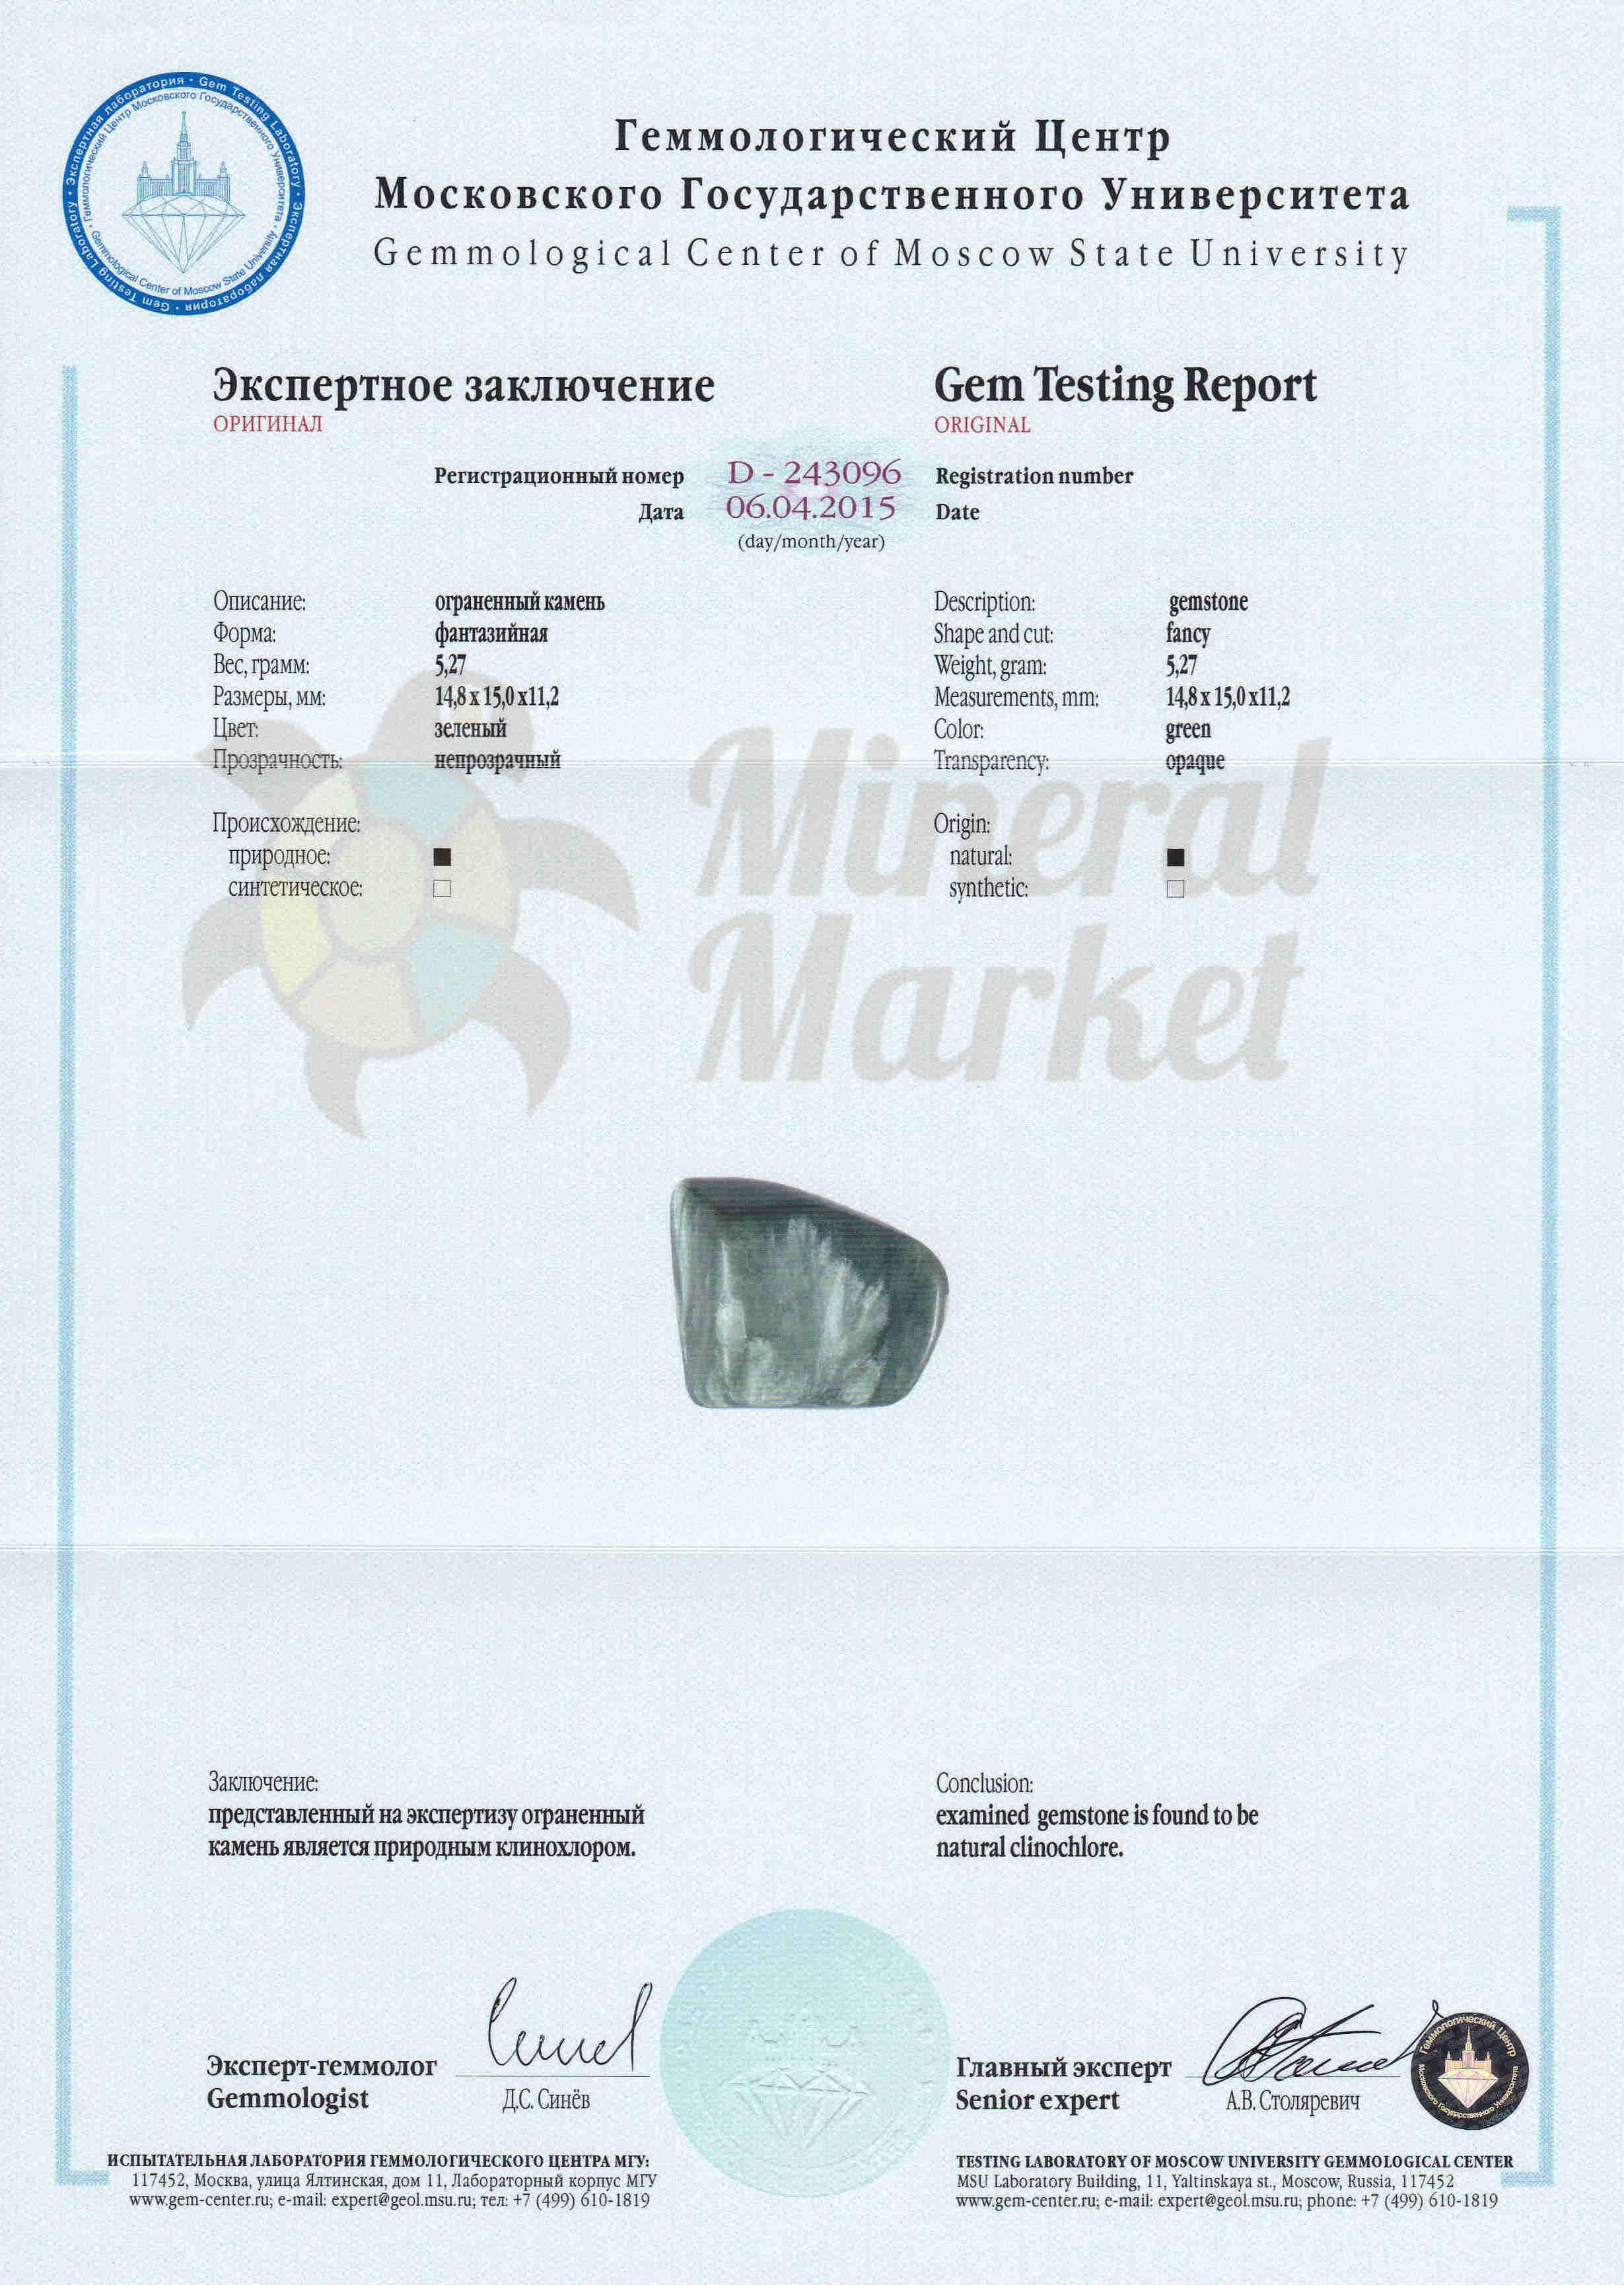 https://mineralmarket.ru/img/certificate/59/59.jpg